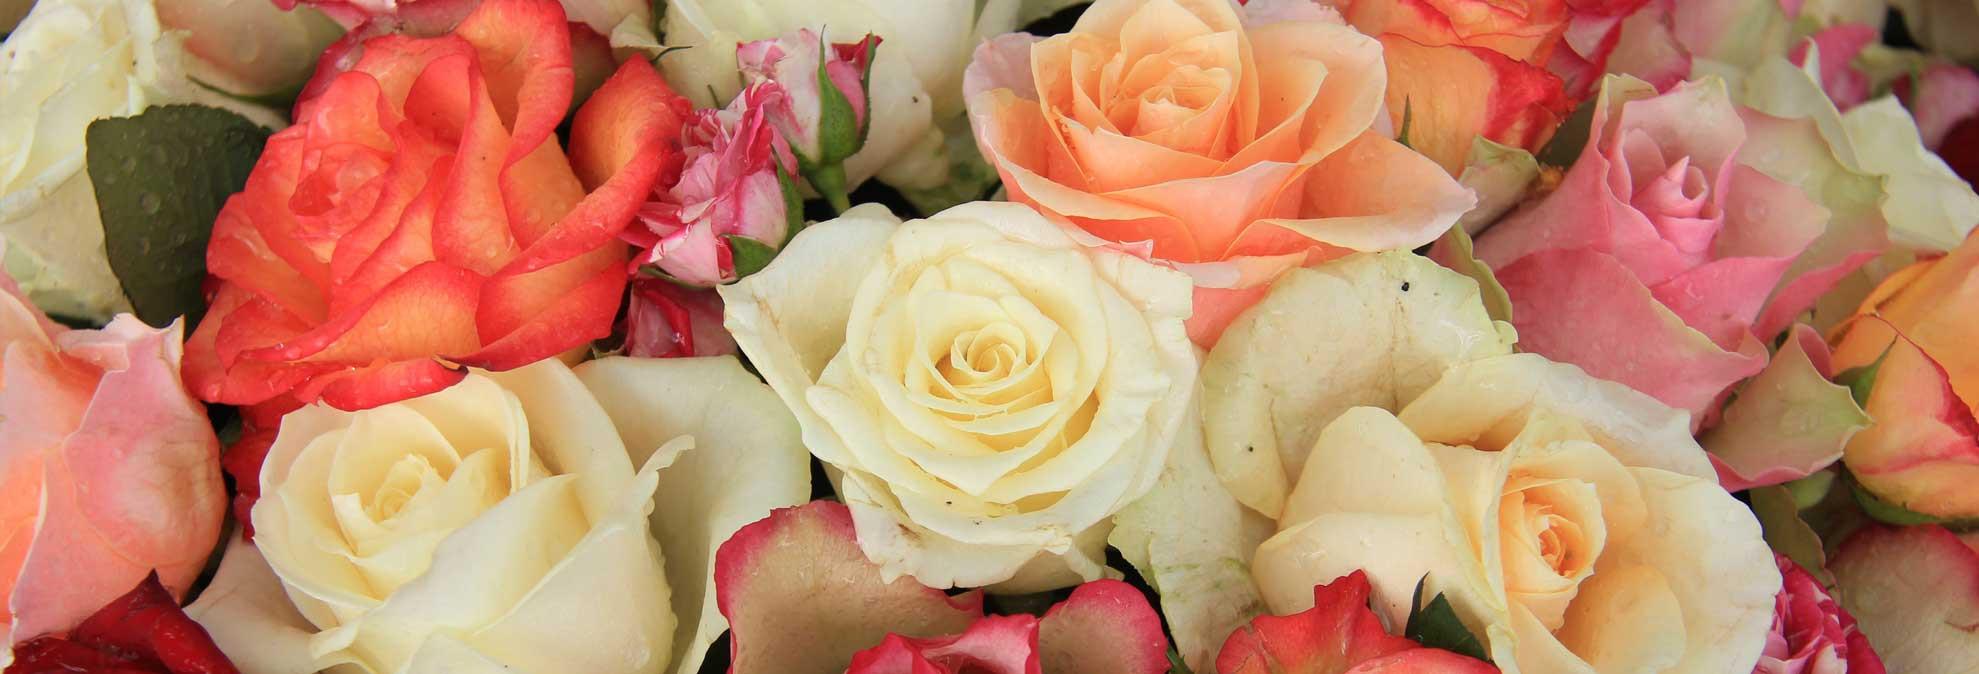 long flower vase online of ordering flowers online consumer reports intended for cr money hero flower delivery 04 16